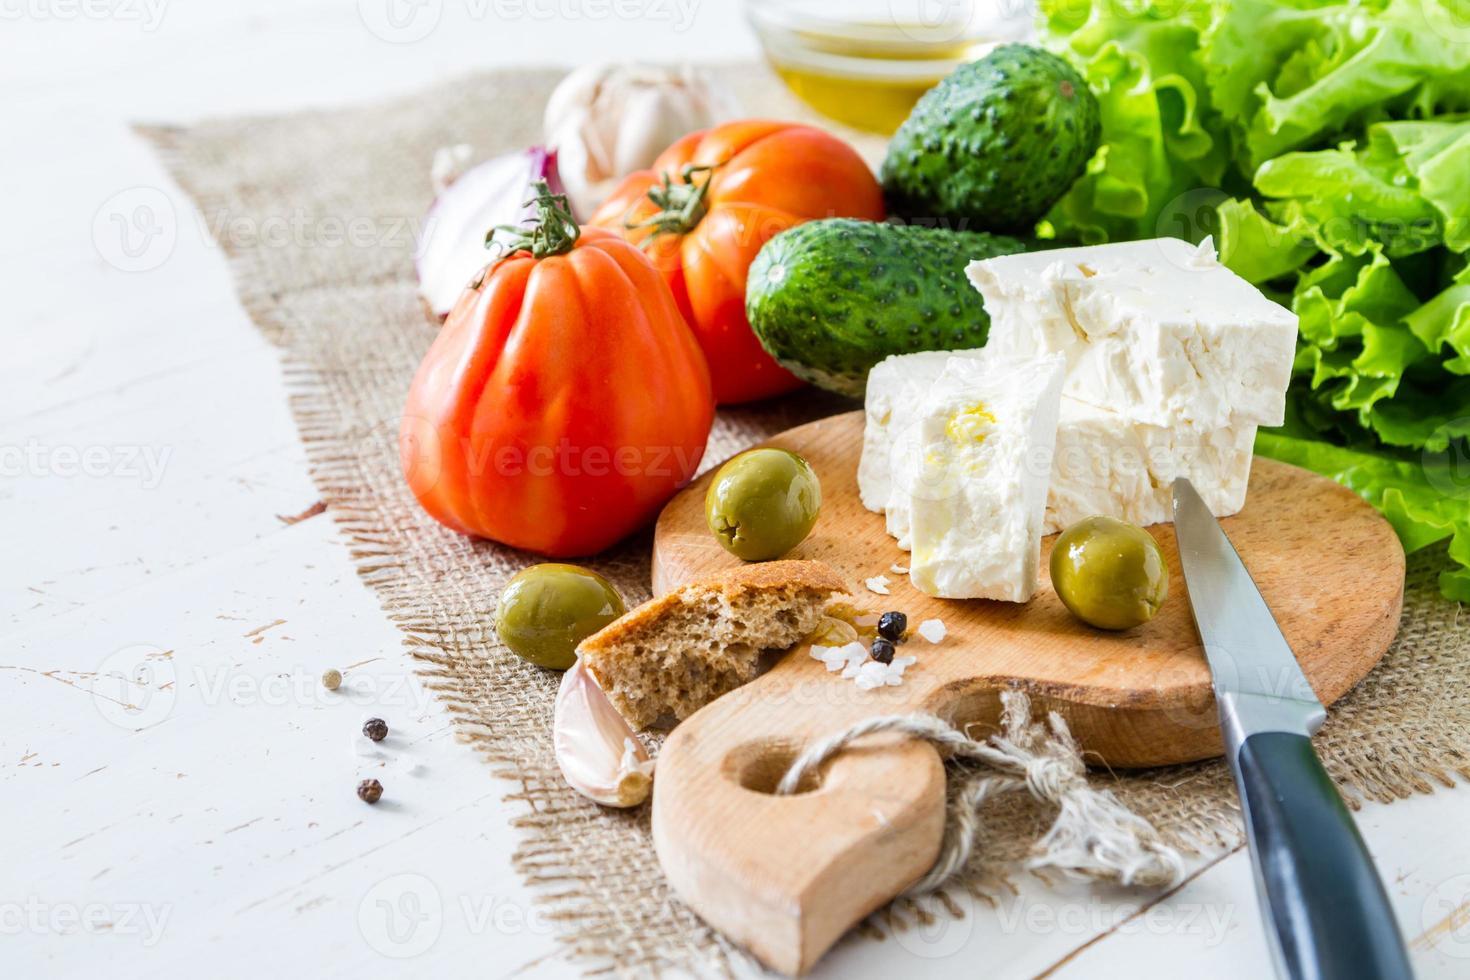 ingredientes da salada - tomate, alface, pepino, queijo feta, cebola, azeitona, alho foto